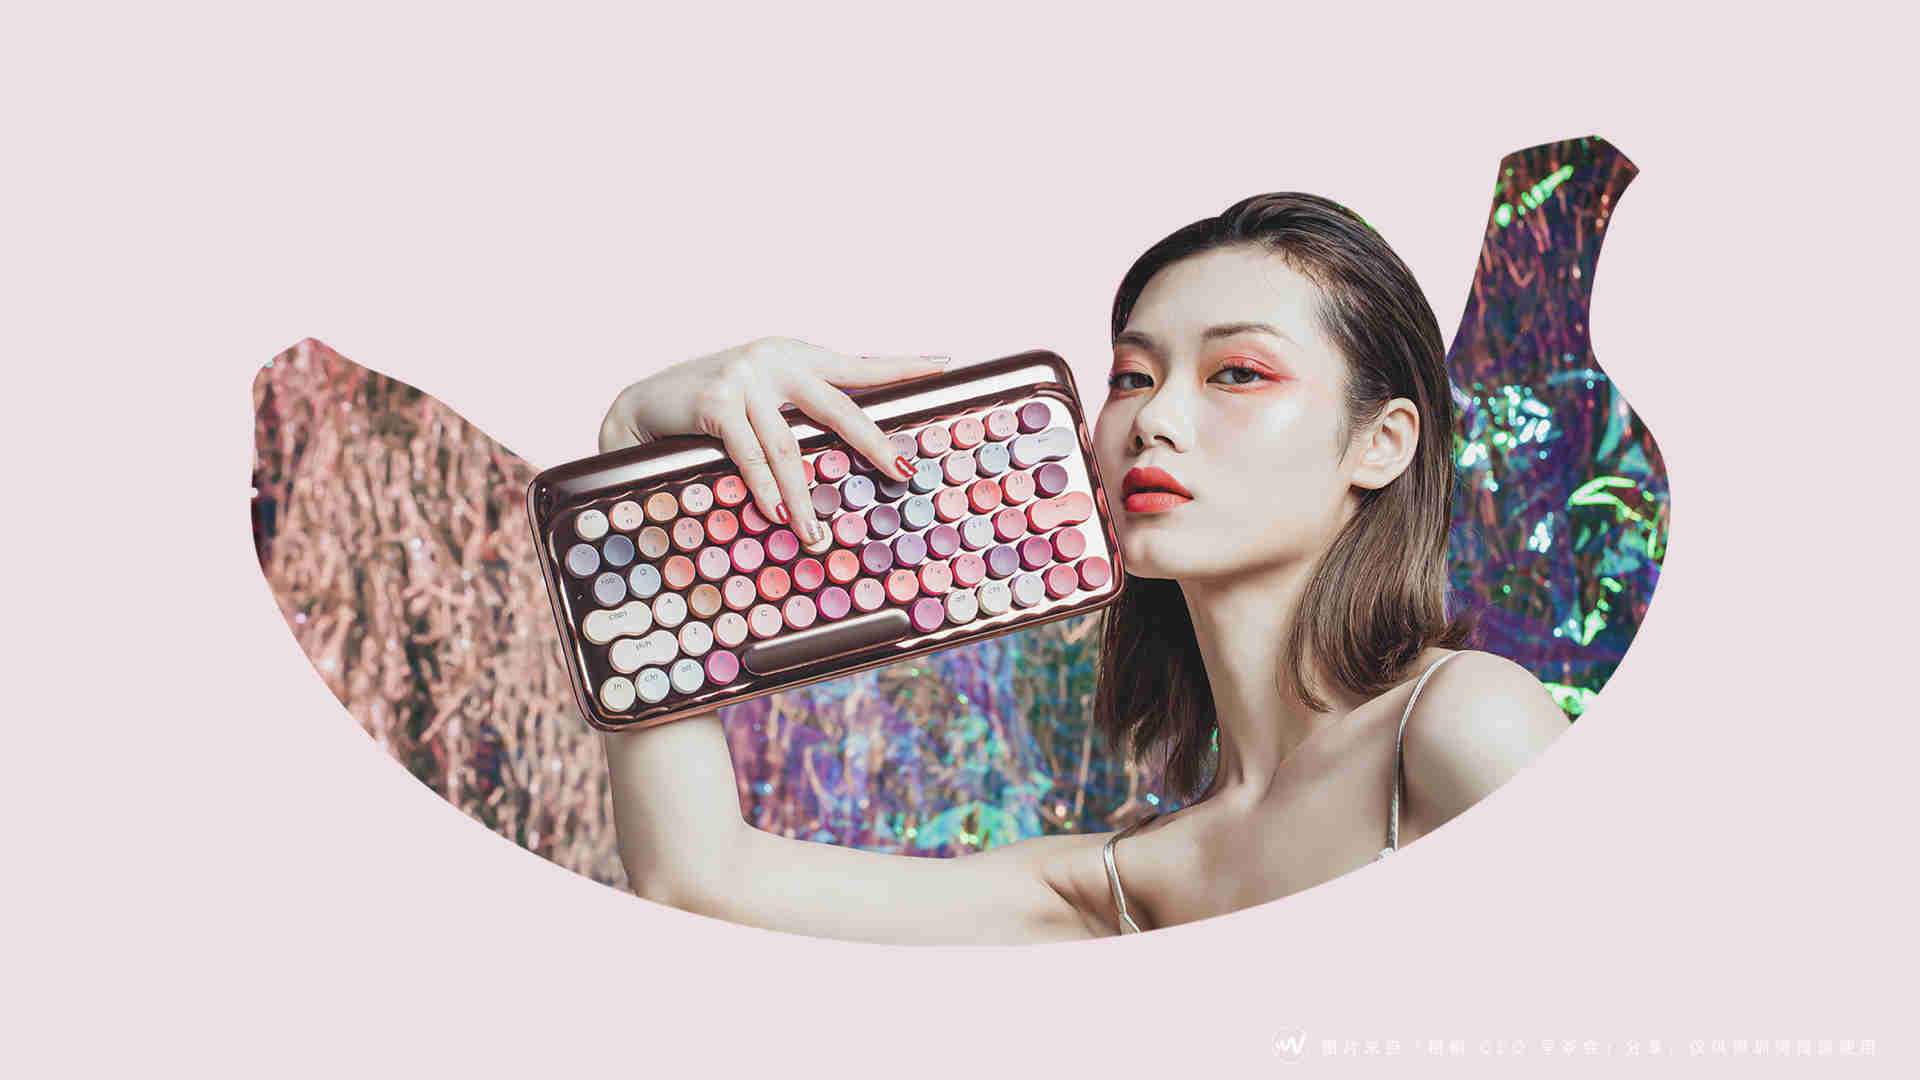 19-Lofree 洛斐口红键盘